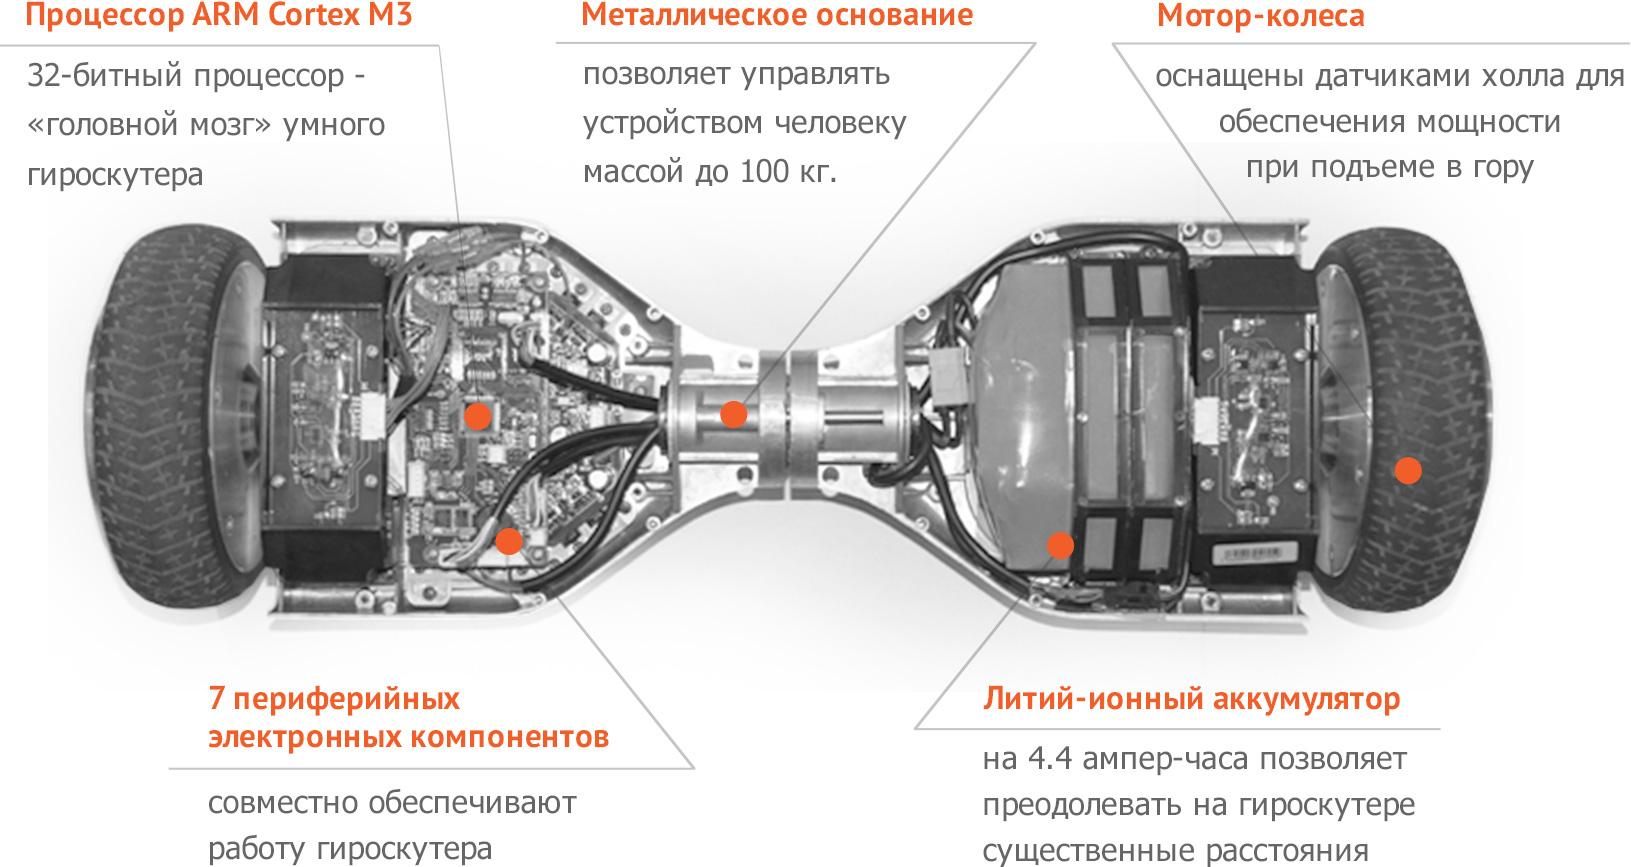 Ремонт гироскутер.jpg